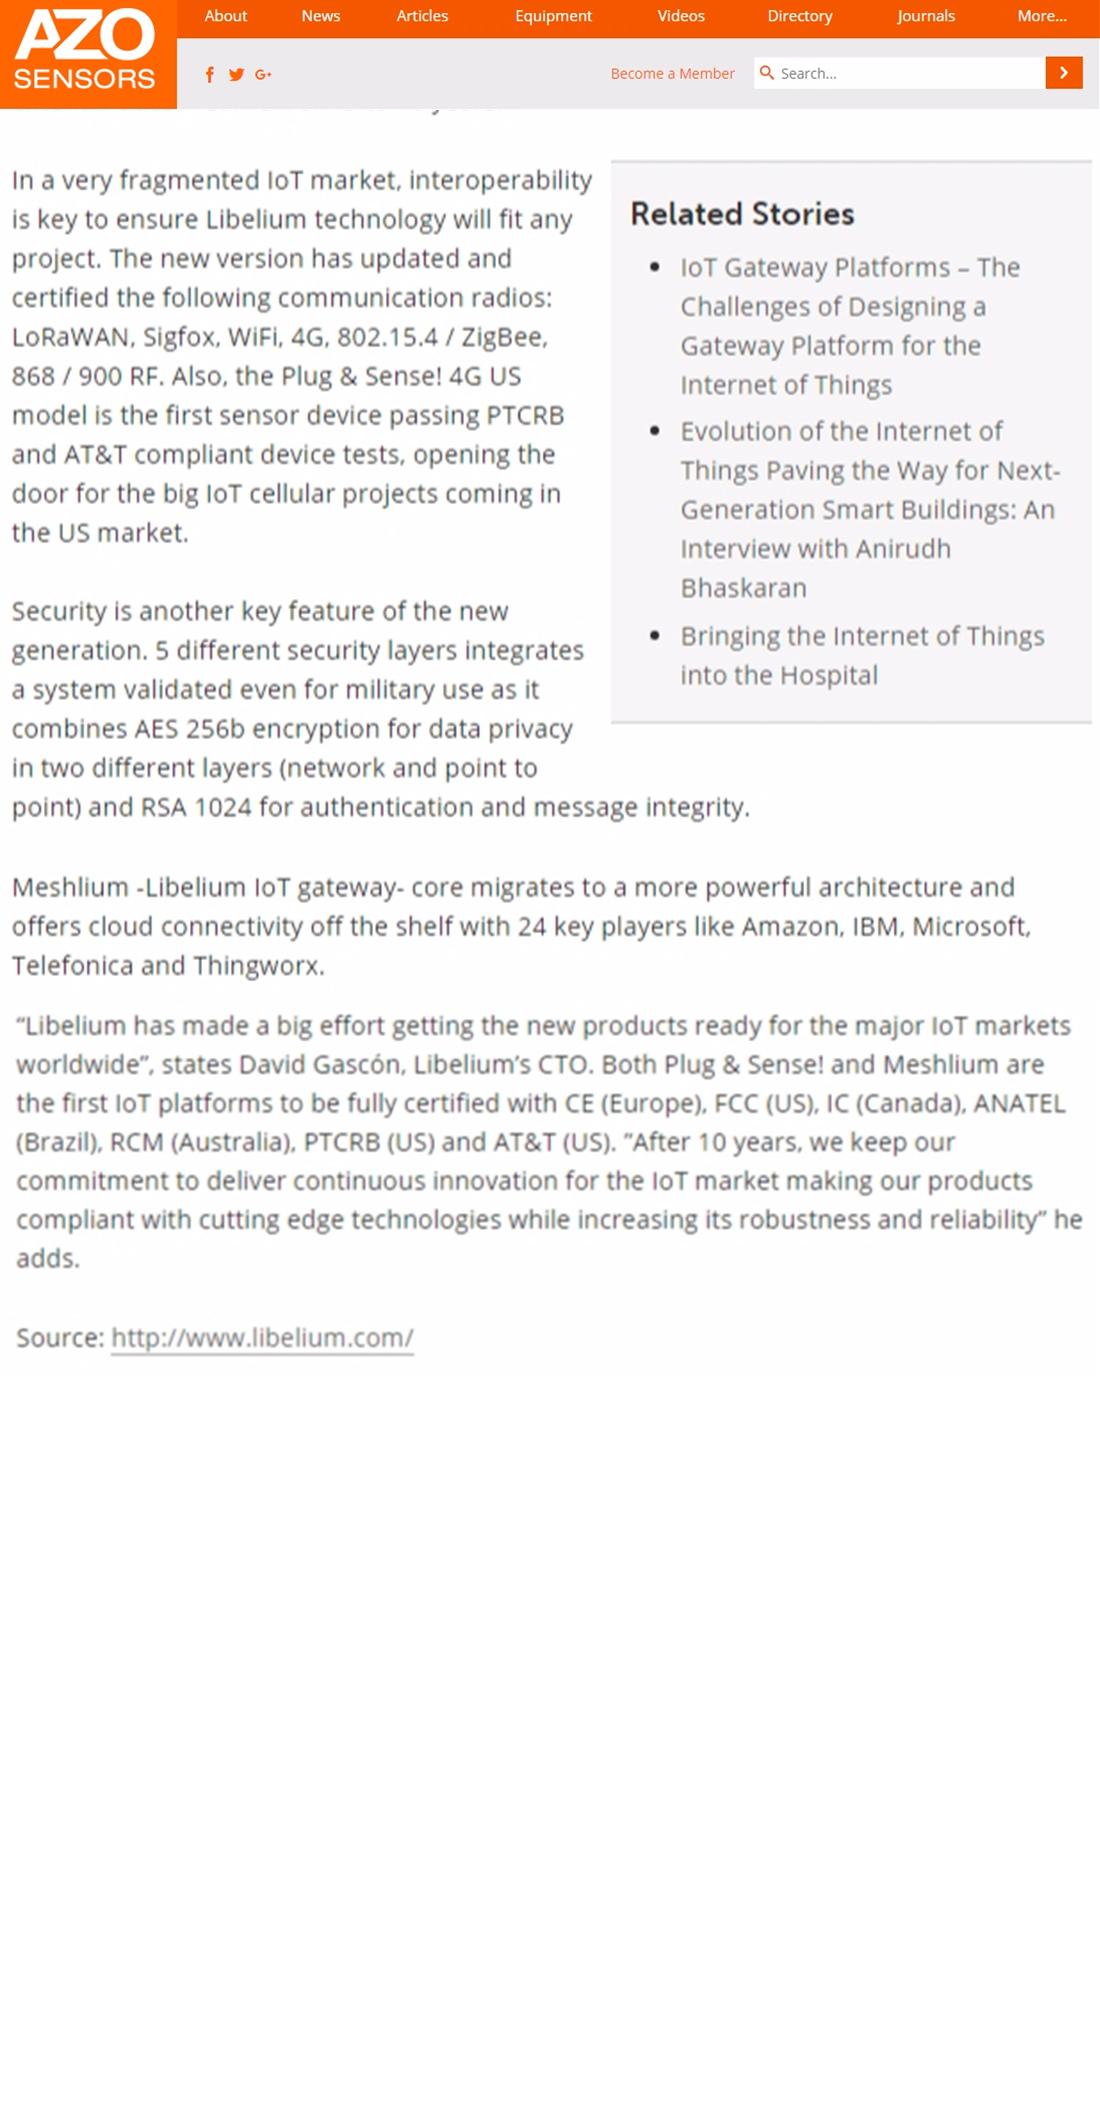 Azo Sensors – Libelium Launches Globally Certified Waspmote IoT Sensor Platform